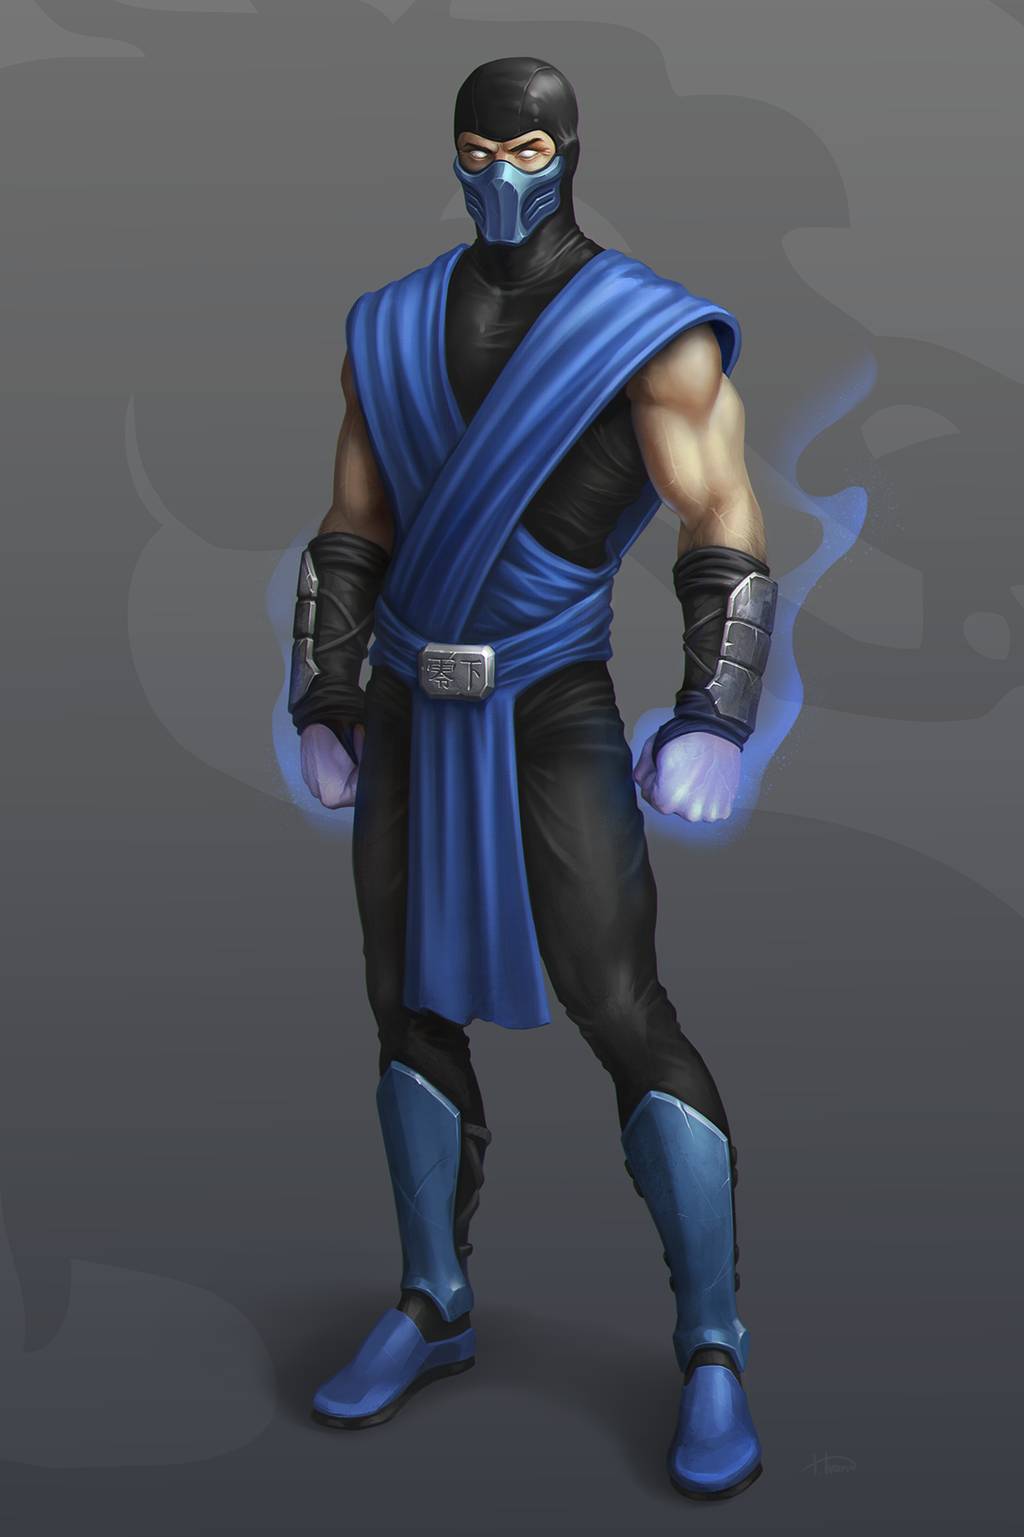 Sub Zero By Ferroconcrete247 On Deviantart Sub Zero Mortal Kombat Mortal Kombat Characters Mortal Kombat Art